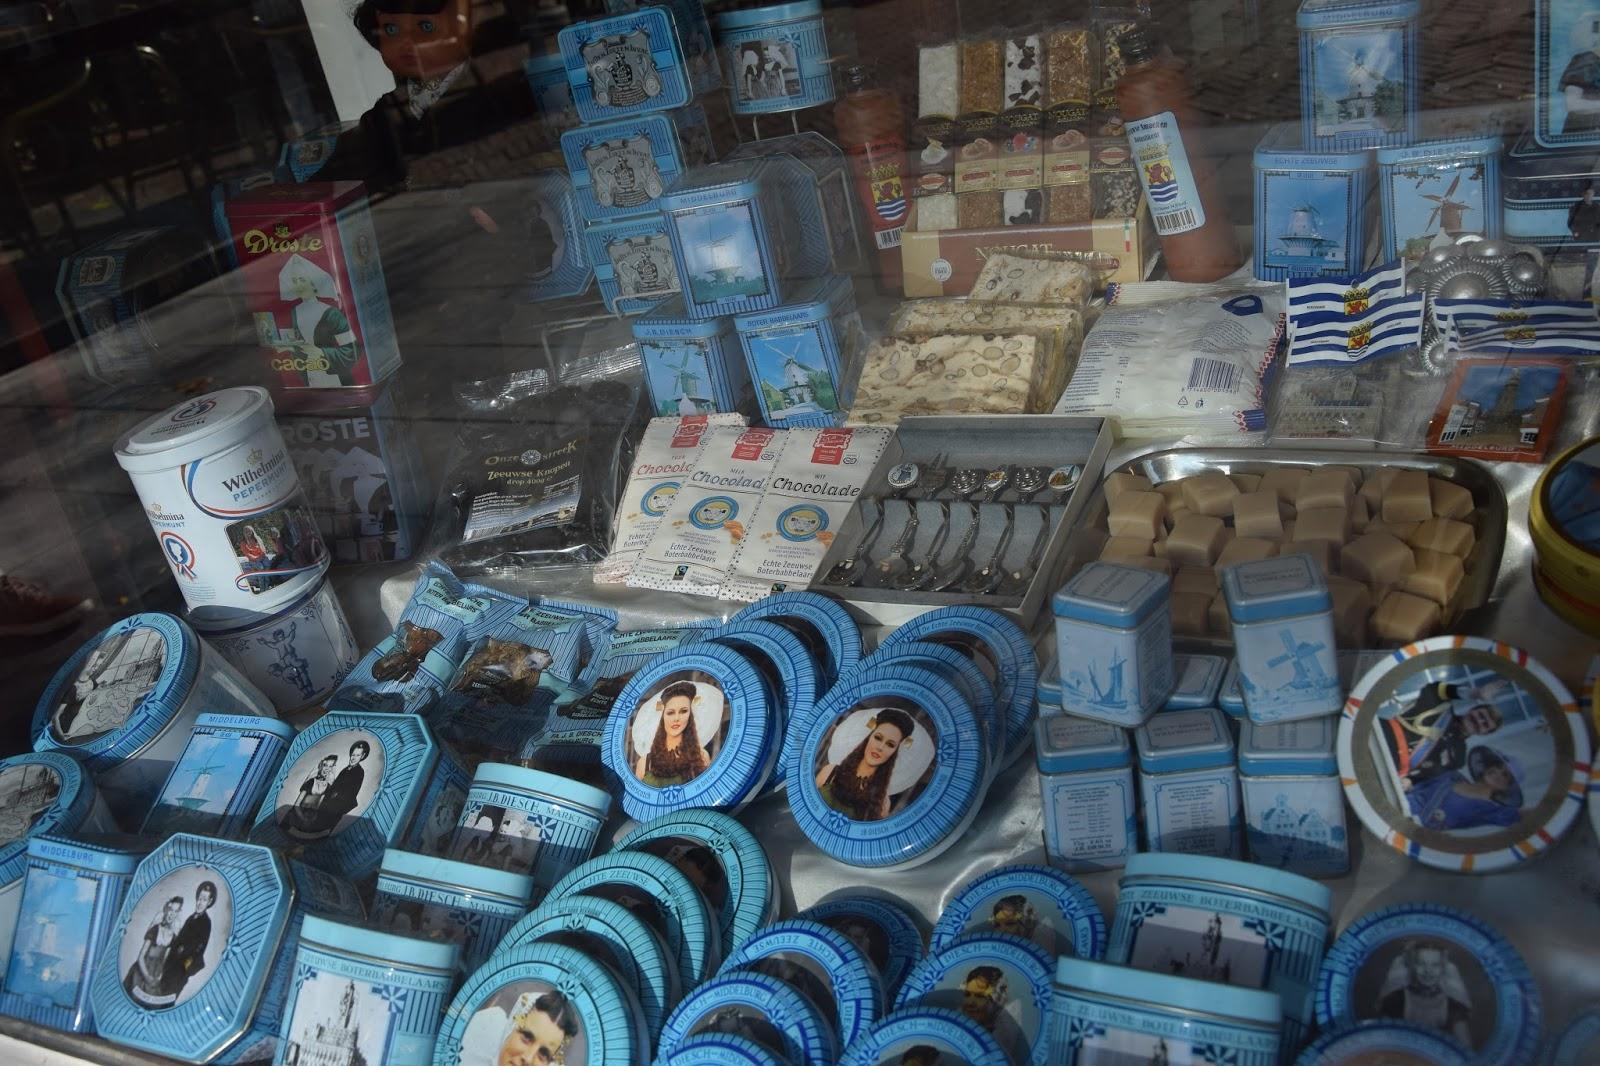 Middelburg produkty lokalne